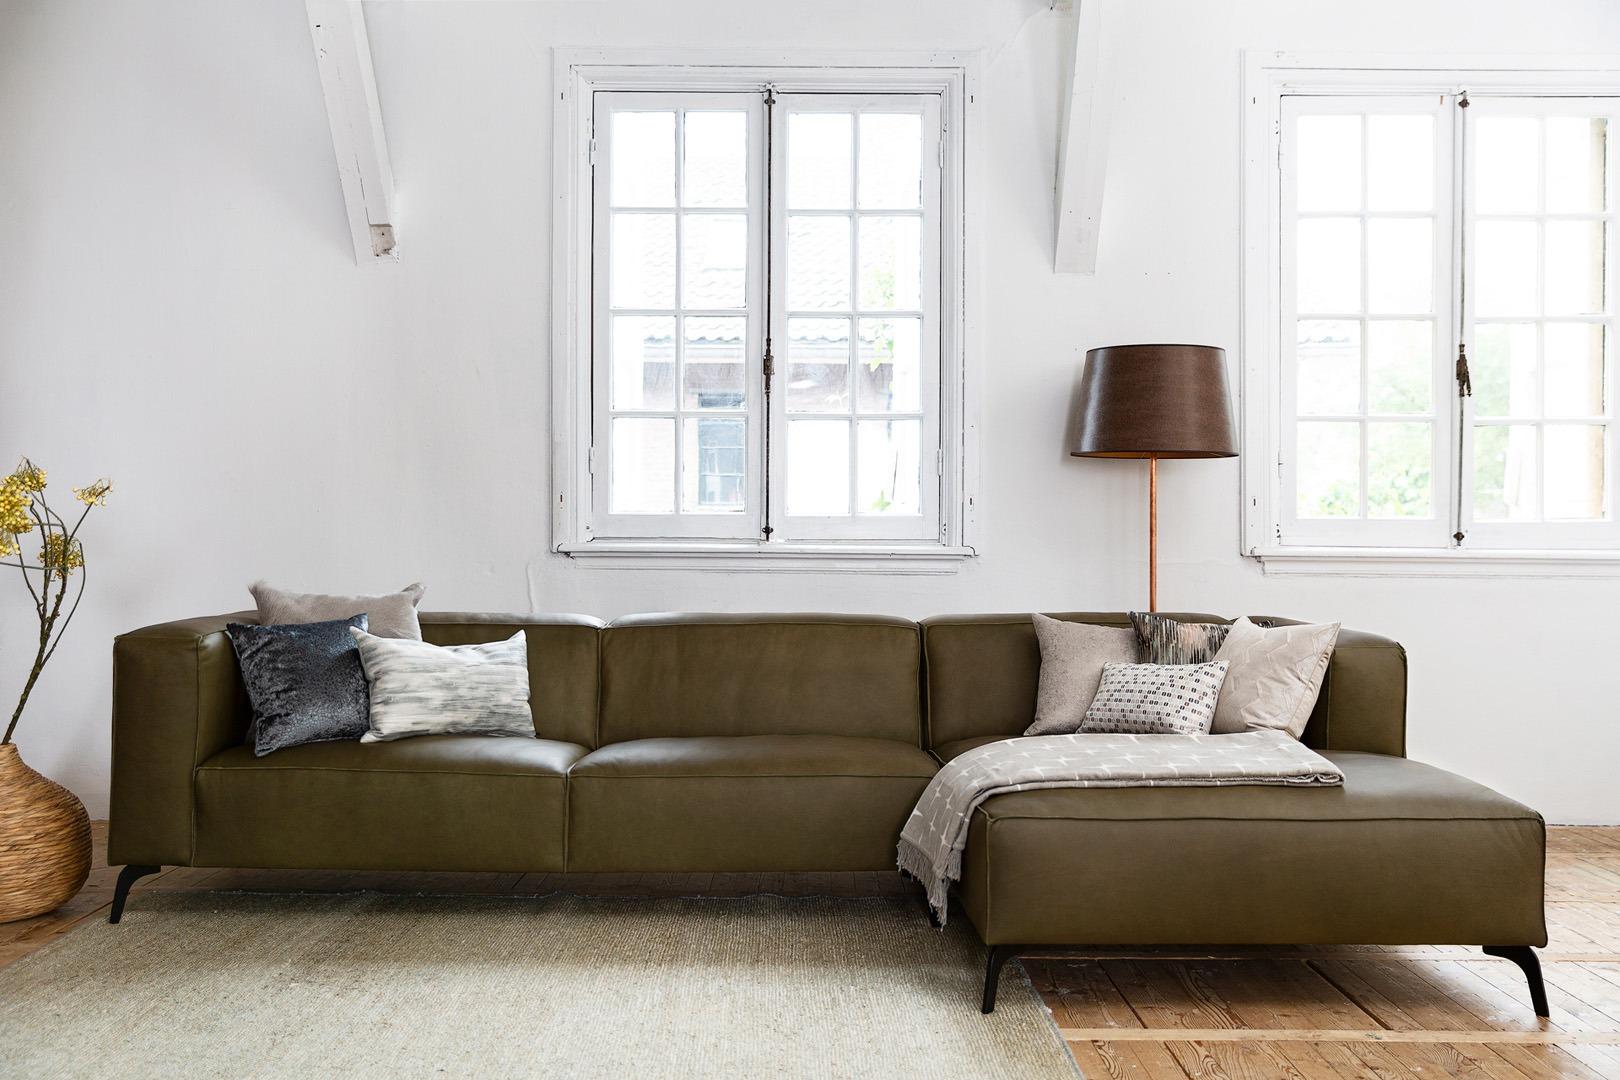 Vino-piemonte-longchair-groen-leer-soofs-interieur. (1)